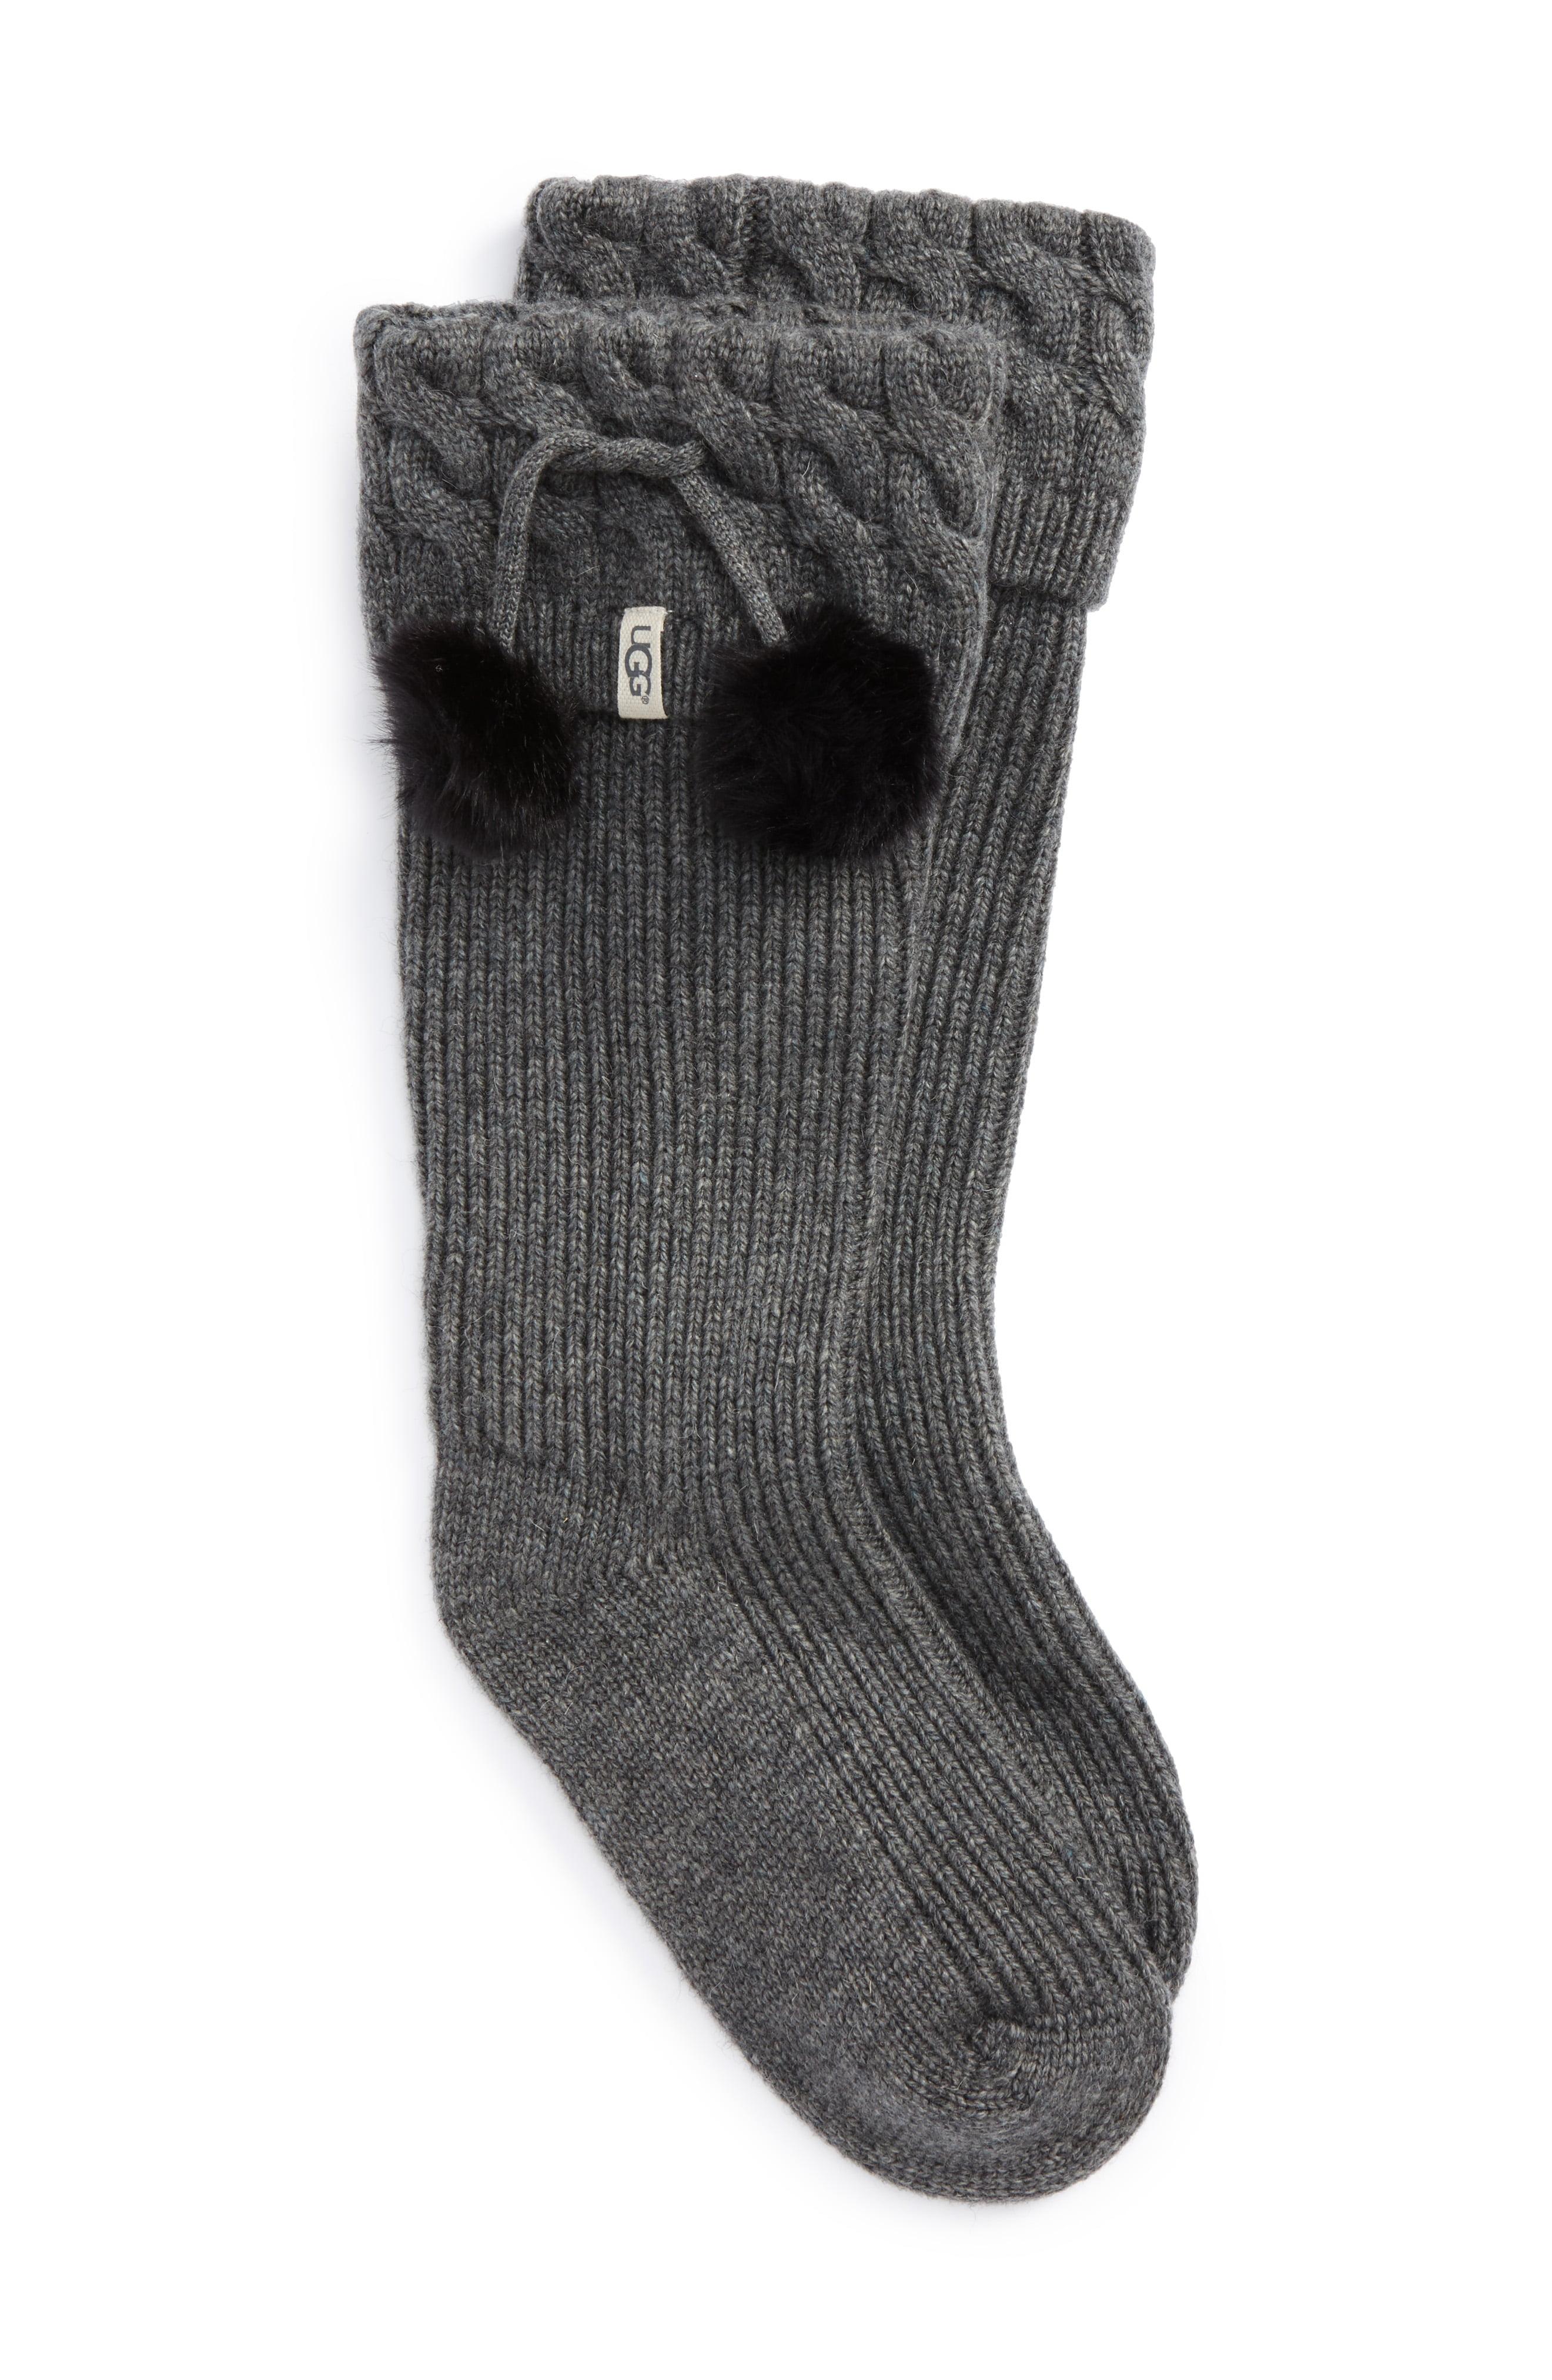 UGG UGGpure(TM) Pompom Tall Rain Boot Sock in 2019